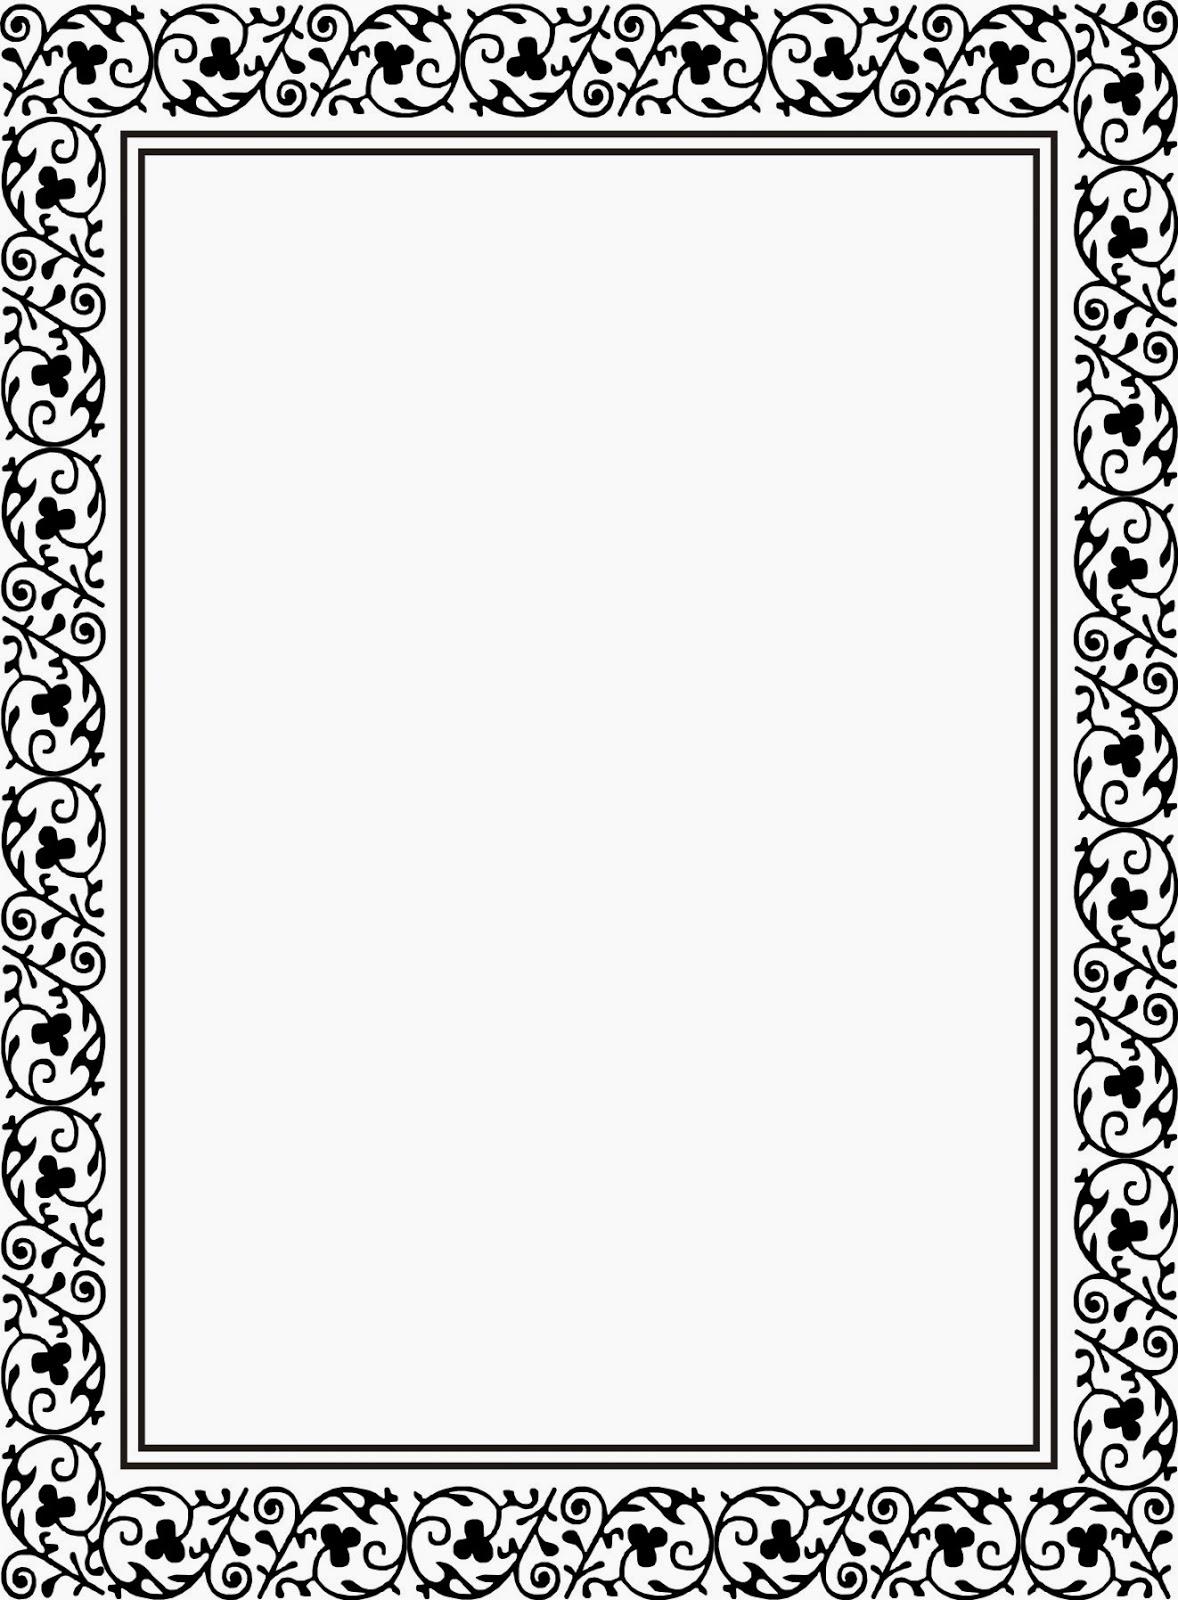 Bingkai Yasin Vector : bingkai, yasin, vector, Kaligrafi, Cover, Yasin, Vector, Cikimm.com